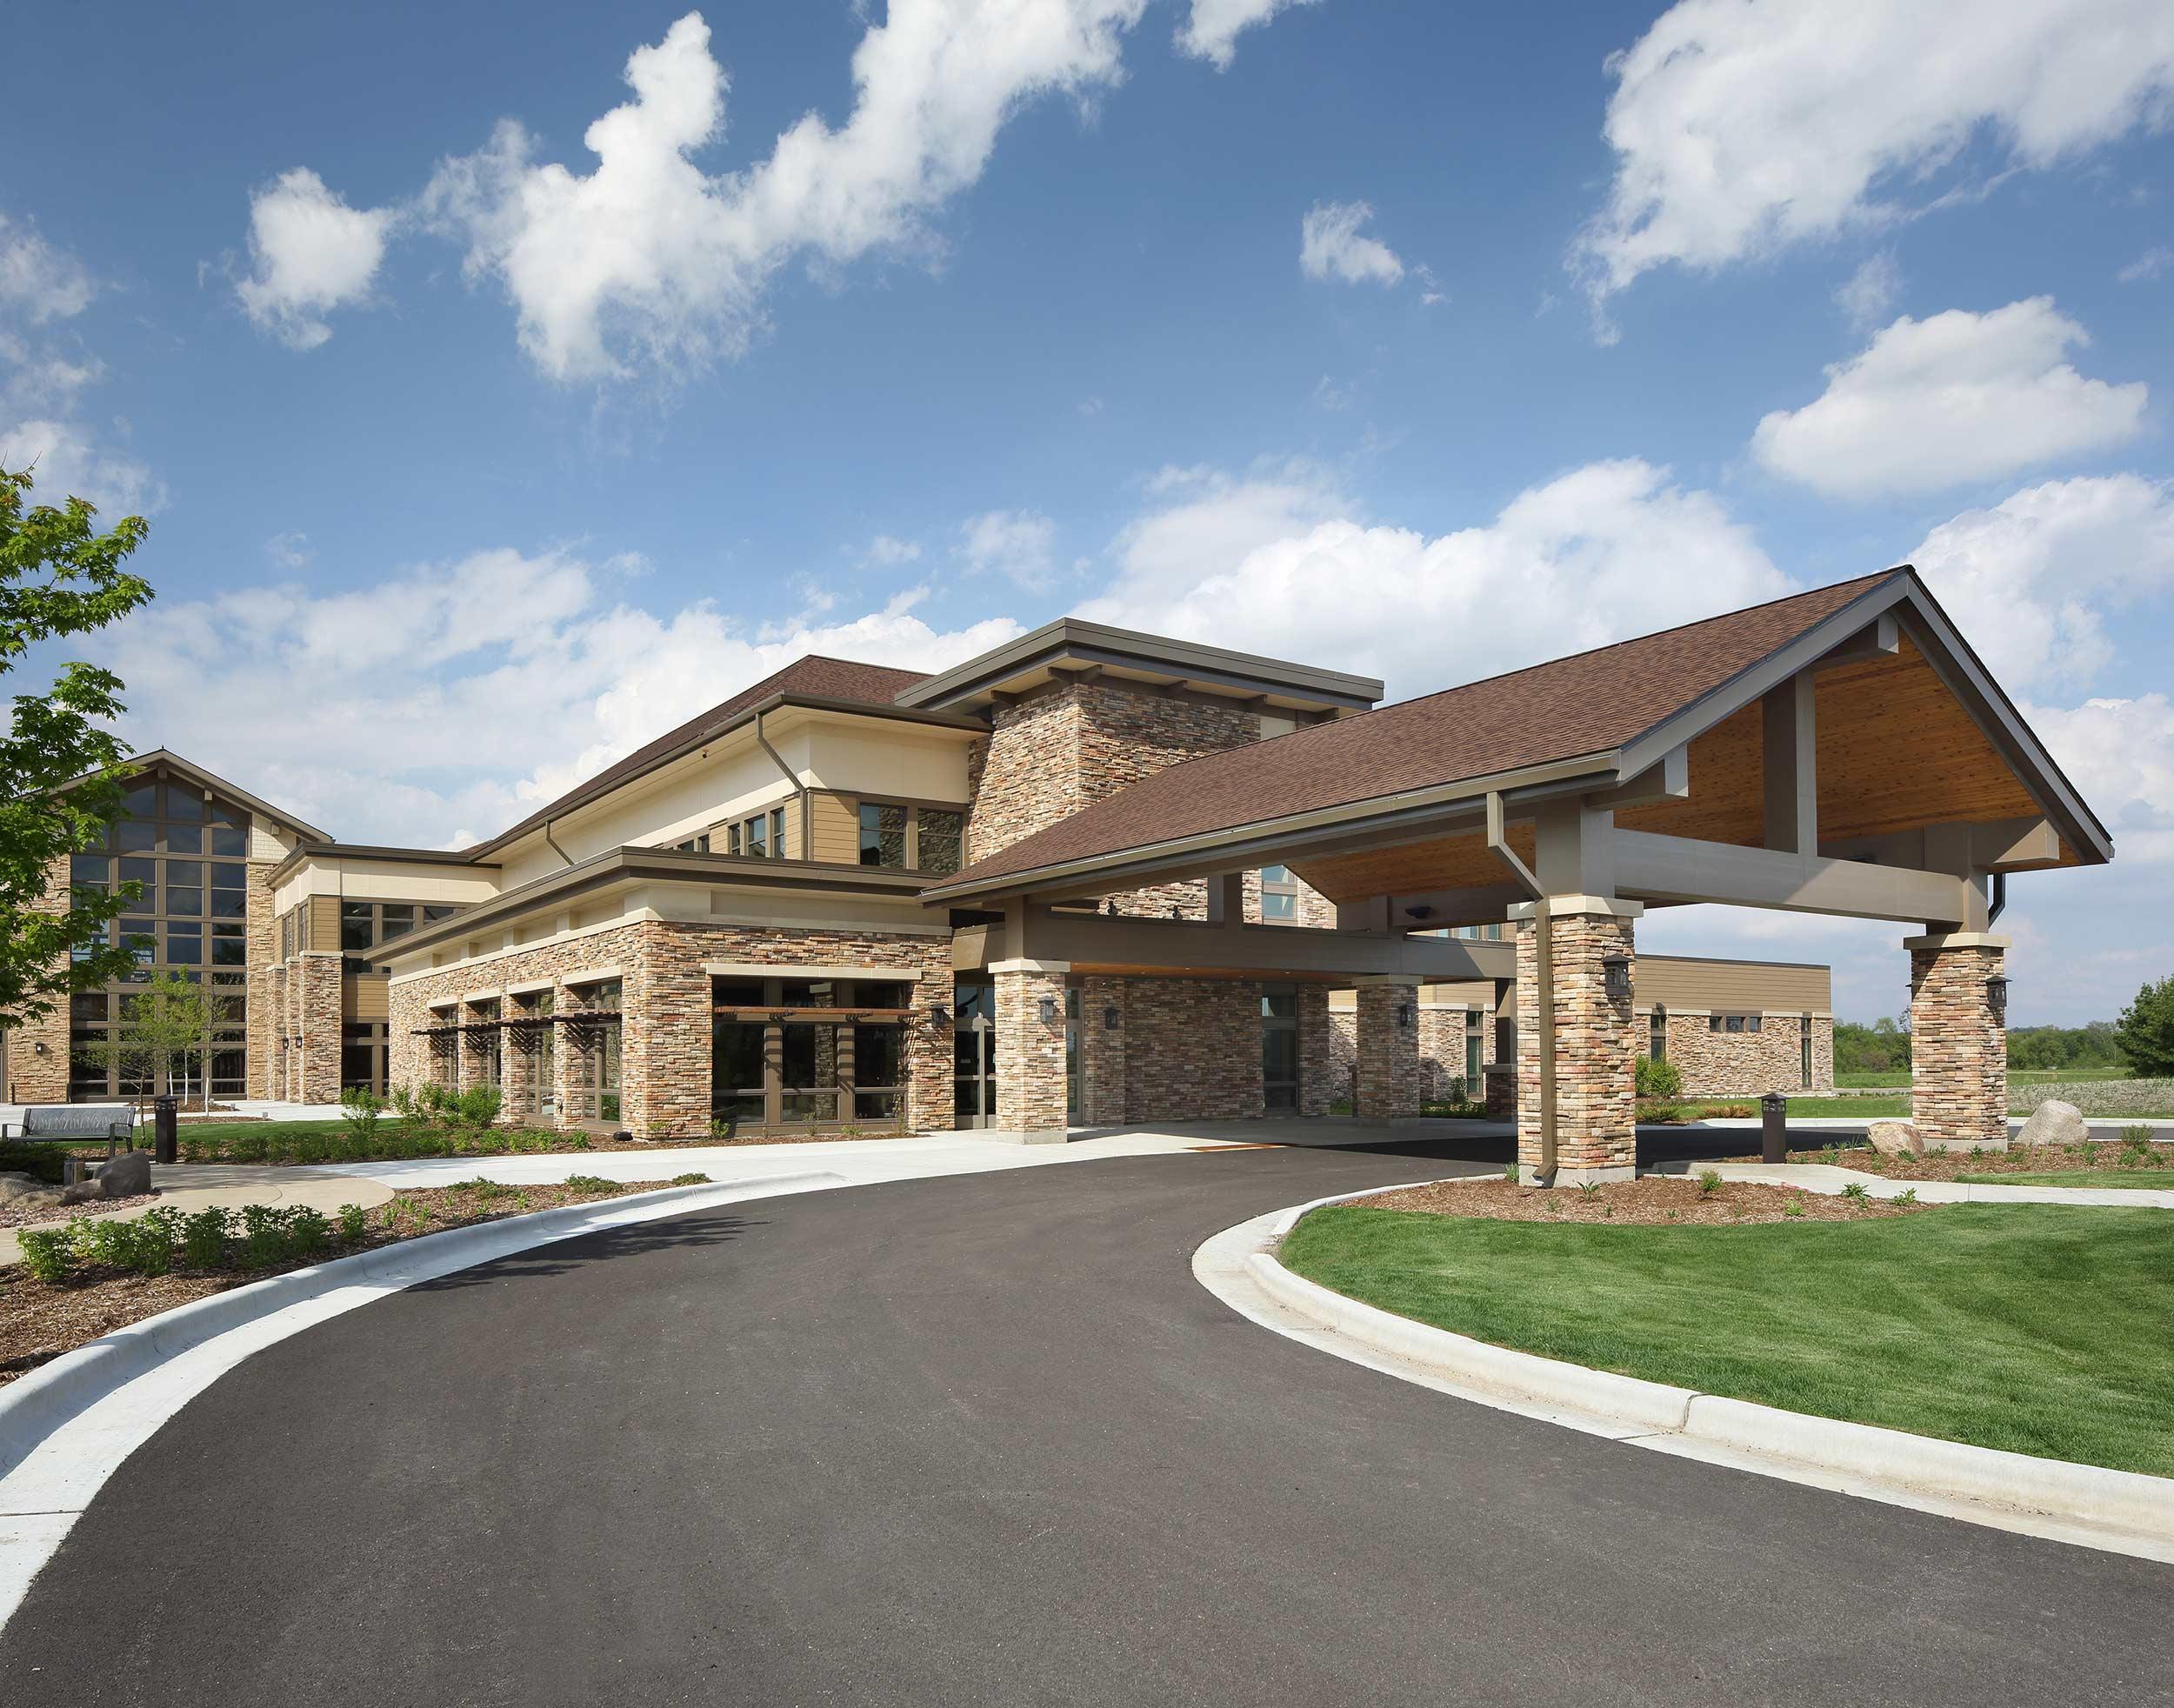 Medical facility exterior photographs